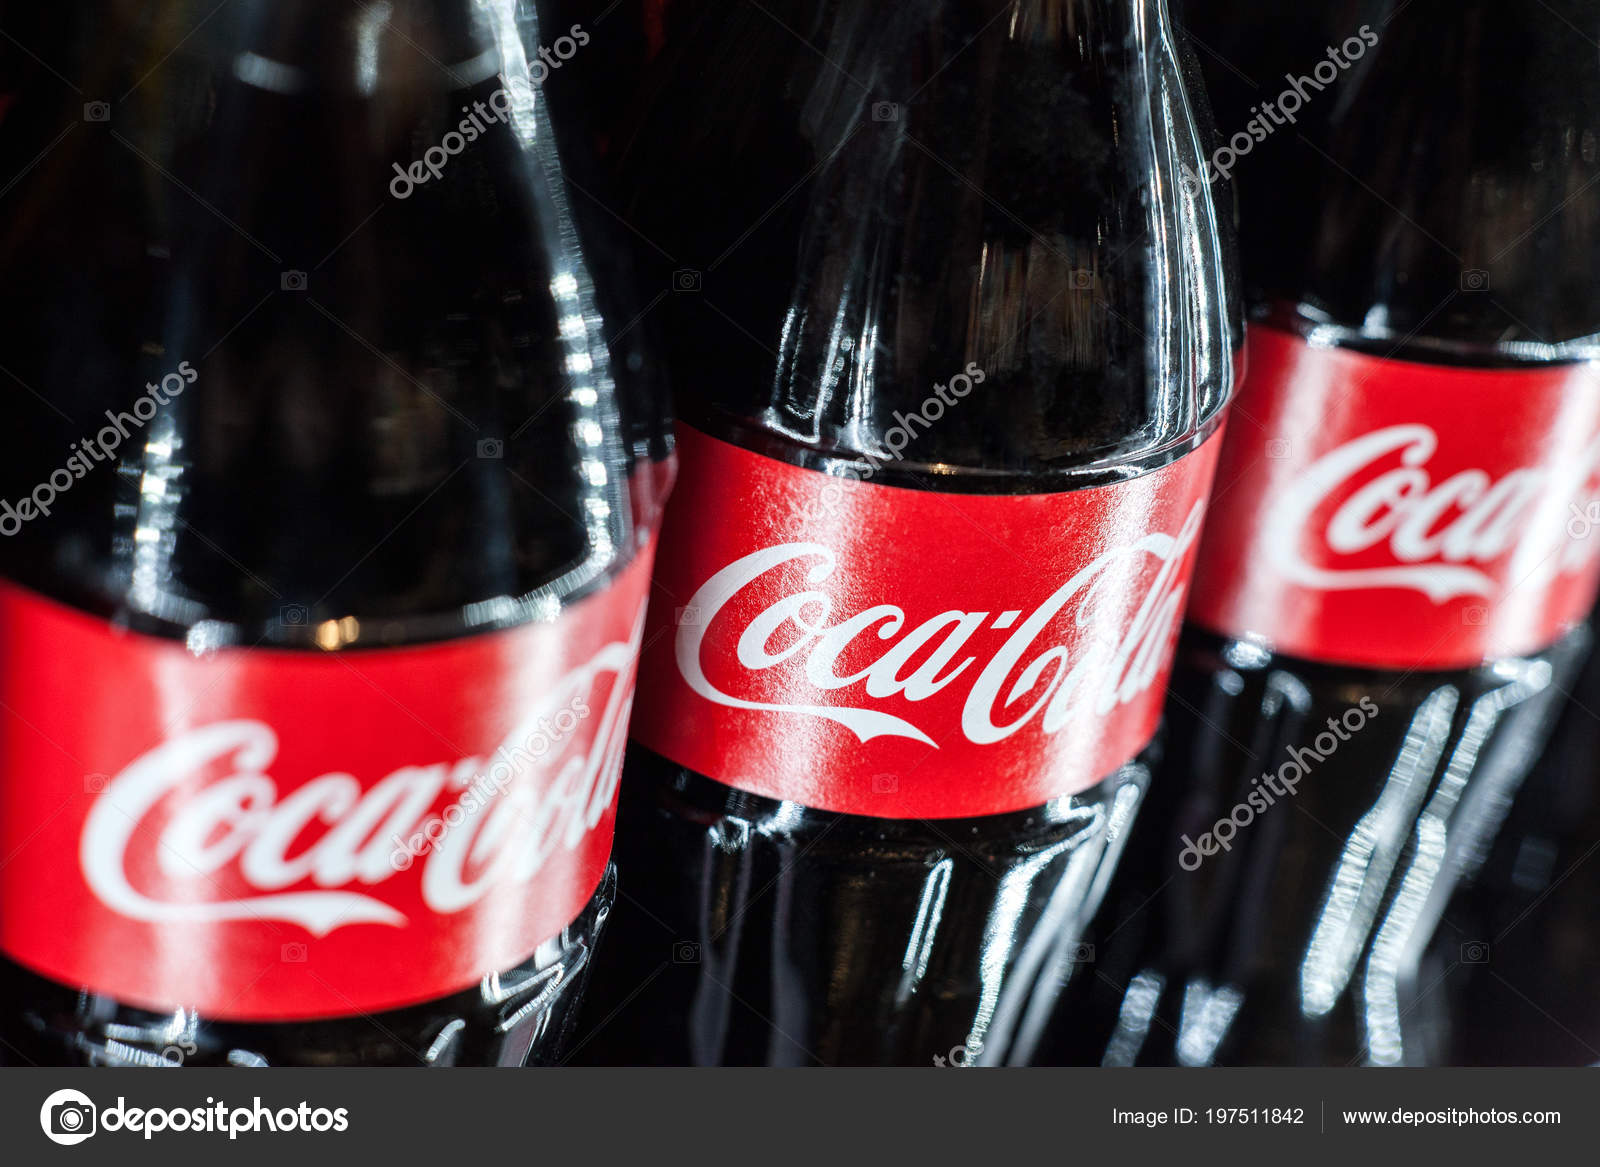 Kühlschrank Coco Cola : Minsk belarus mai 2018 coca cola glas flaschen kühlschrank hautnah